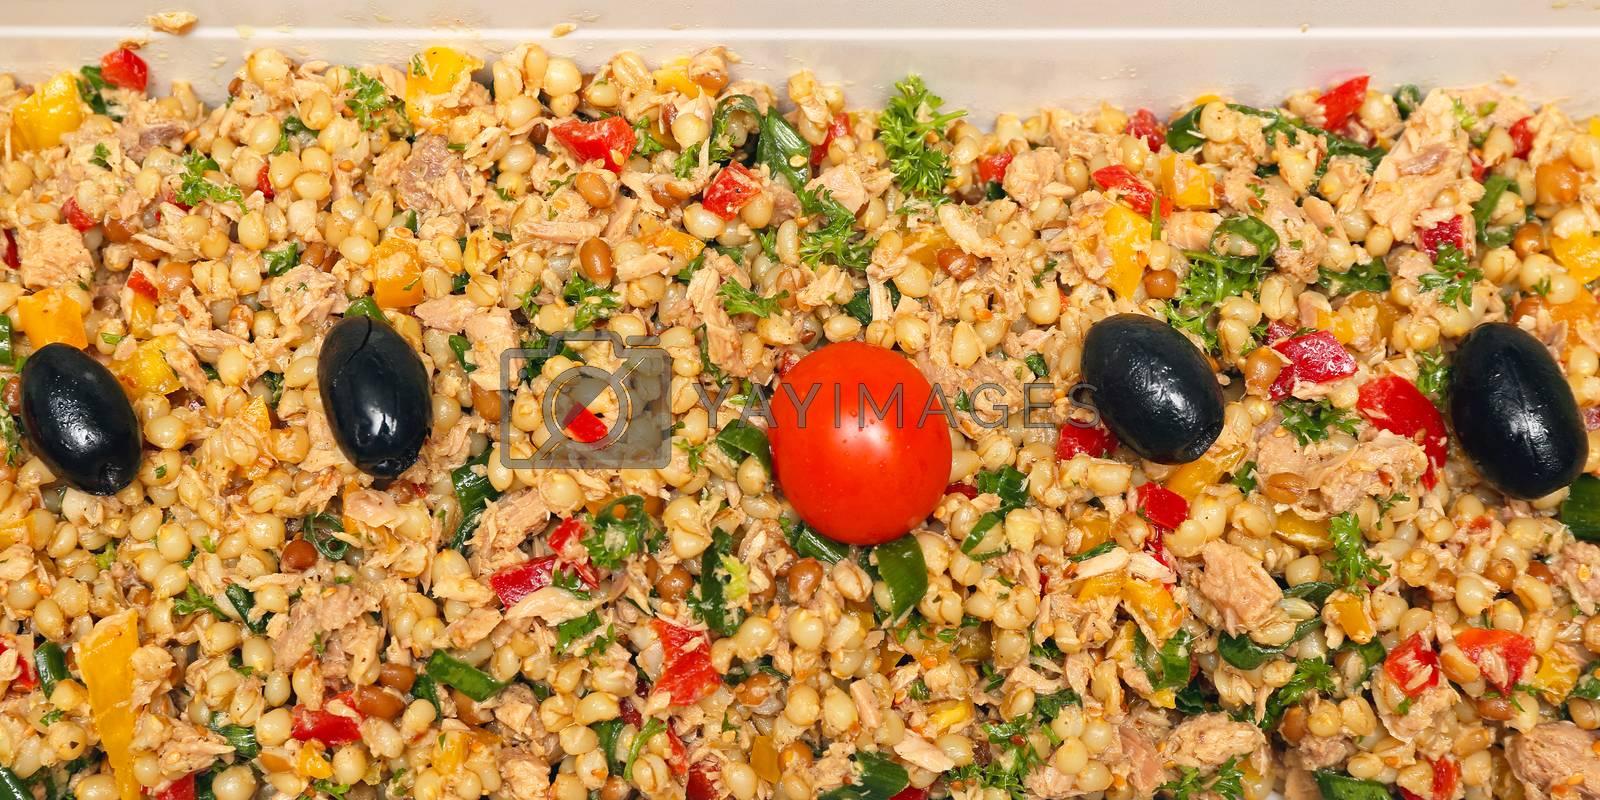 Spelt Wheat Grains With Tuna Salad Meal